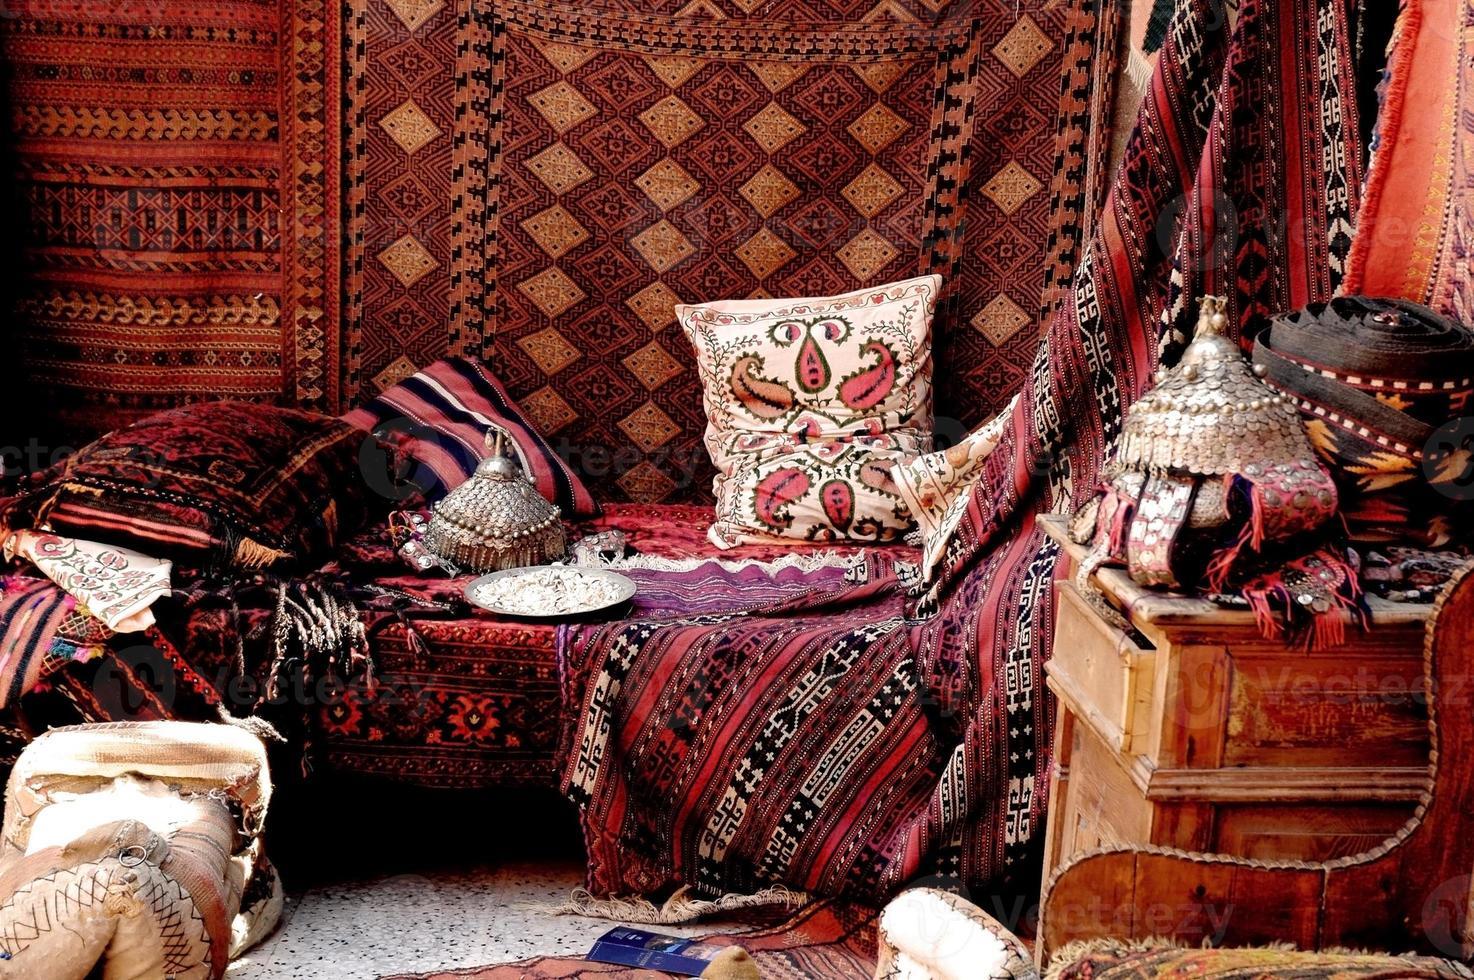 A beautiful look inside a Turkish carpet store in a Bazaar photo